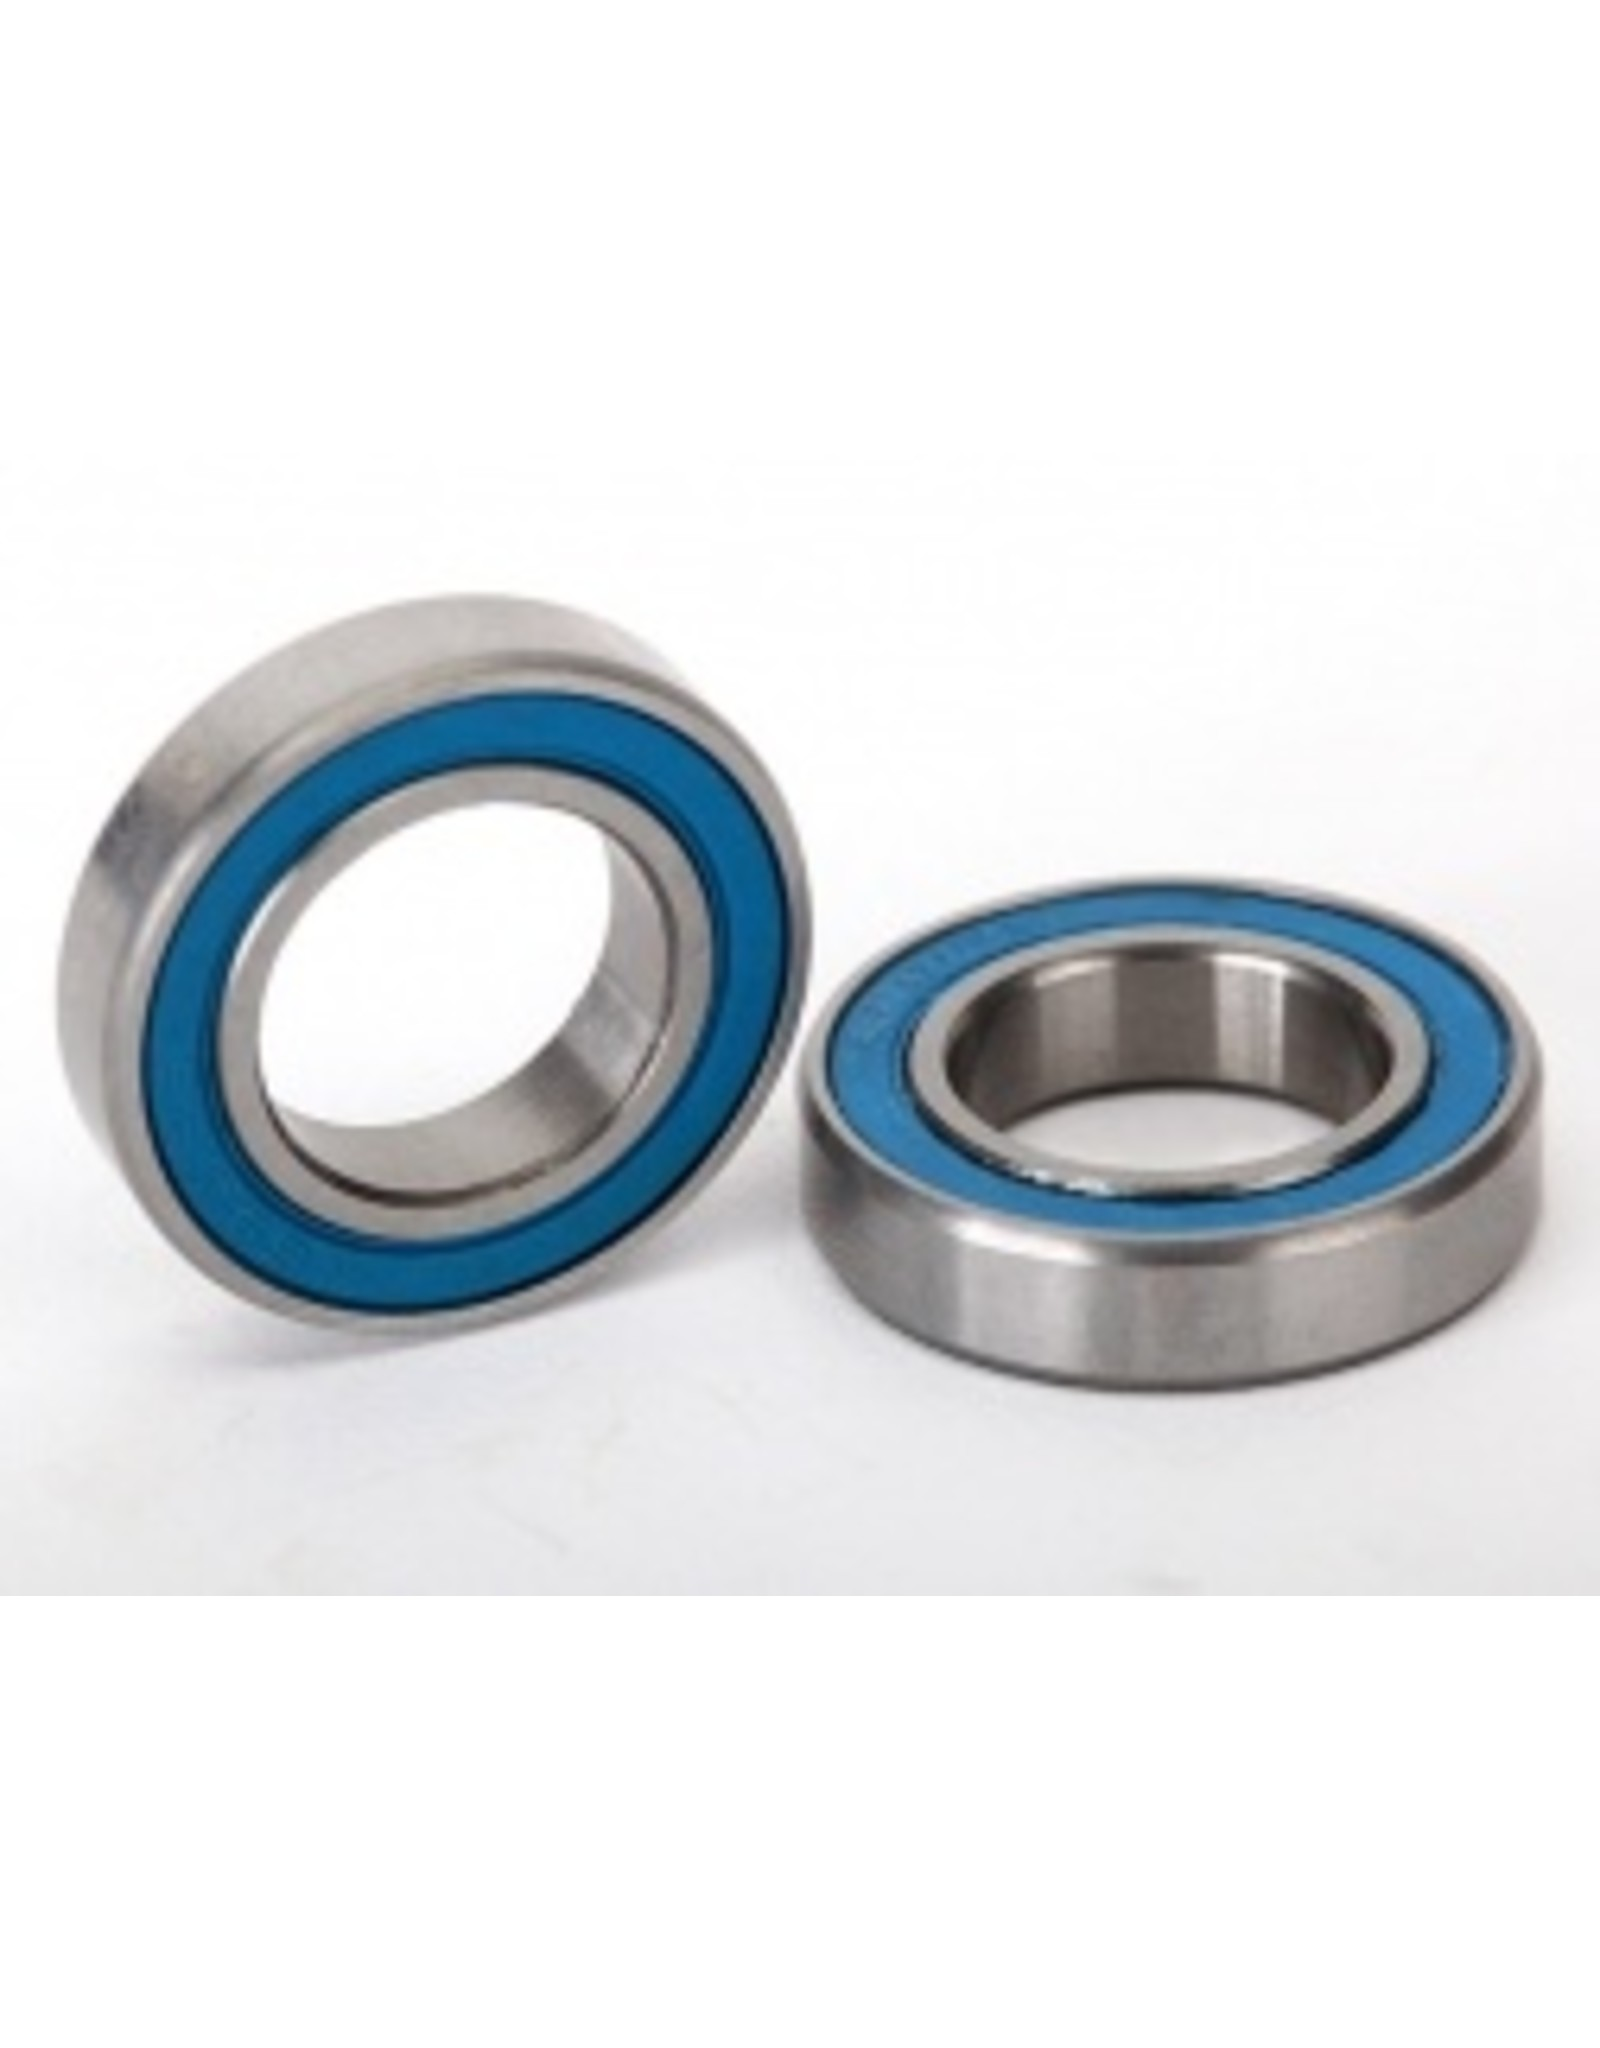 Traxxas Ball bearings, blue rubber sealed (12x21x5mm) (2) (5101)